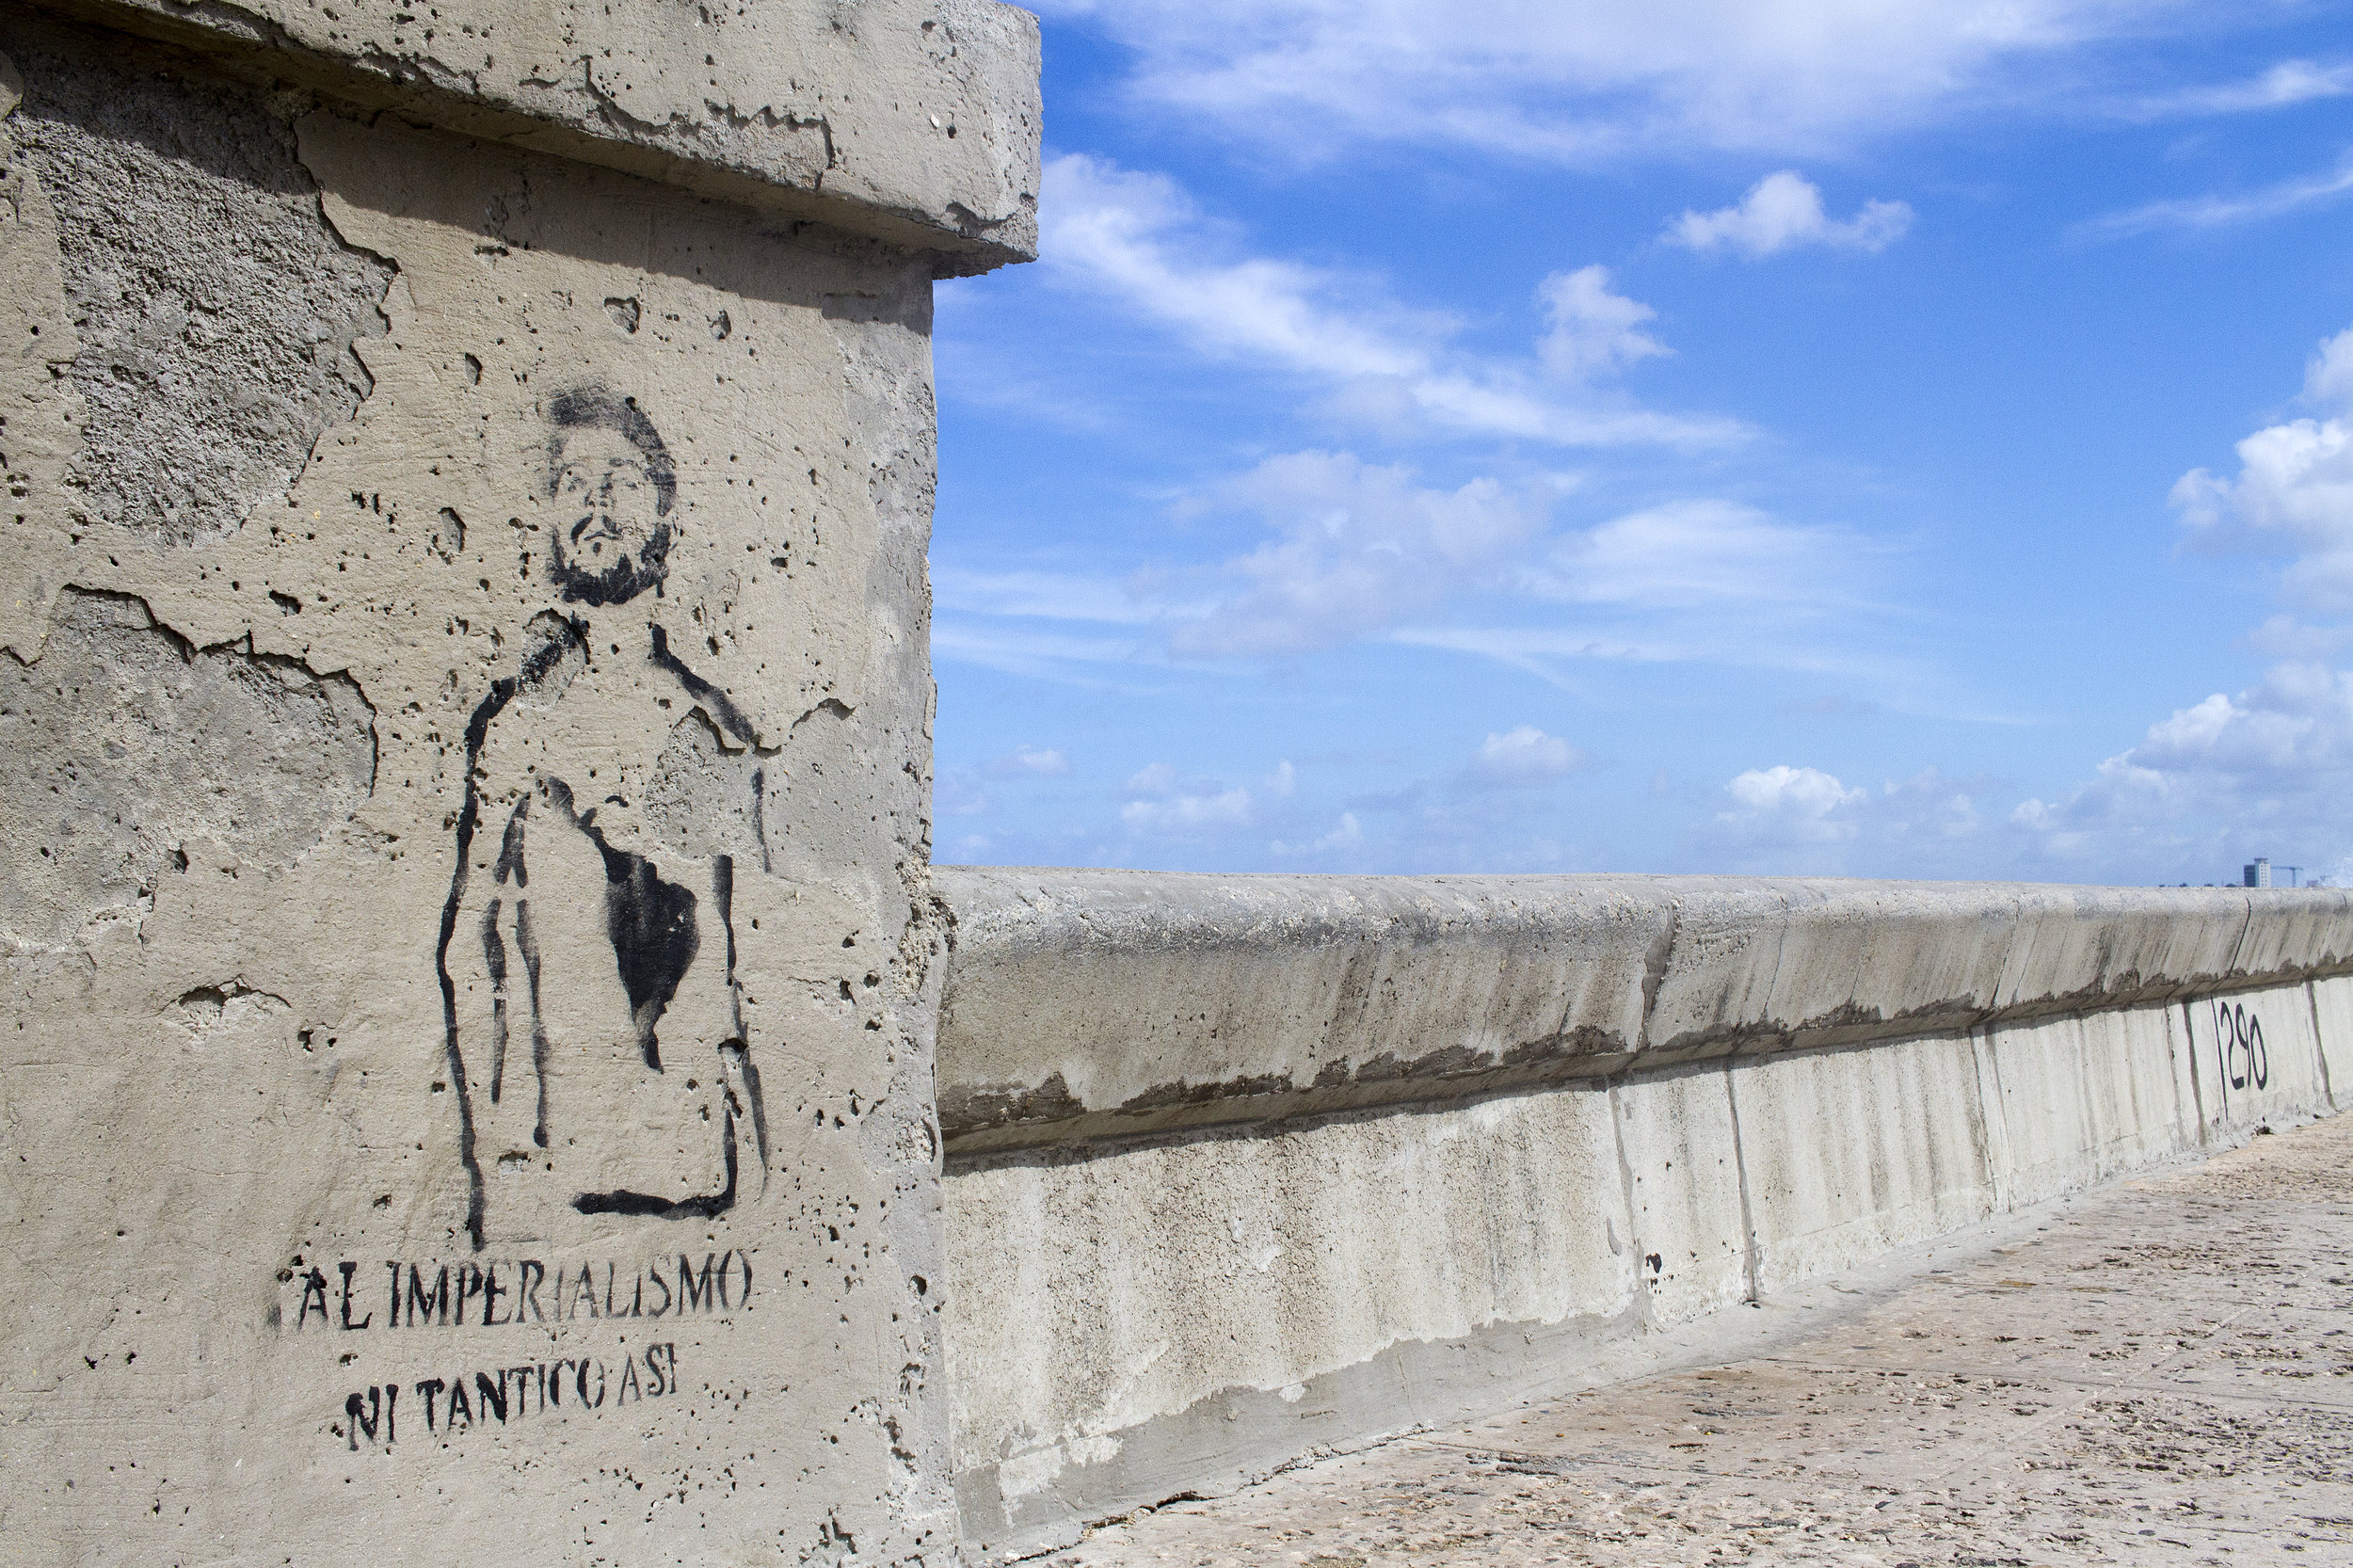 Graffiti on the Malecón